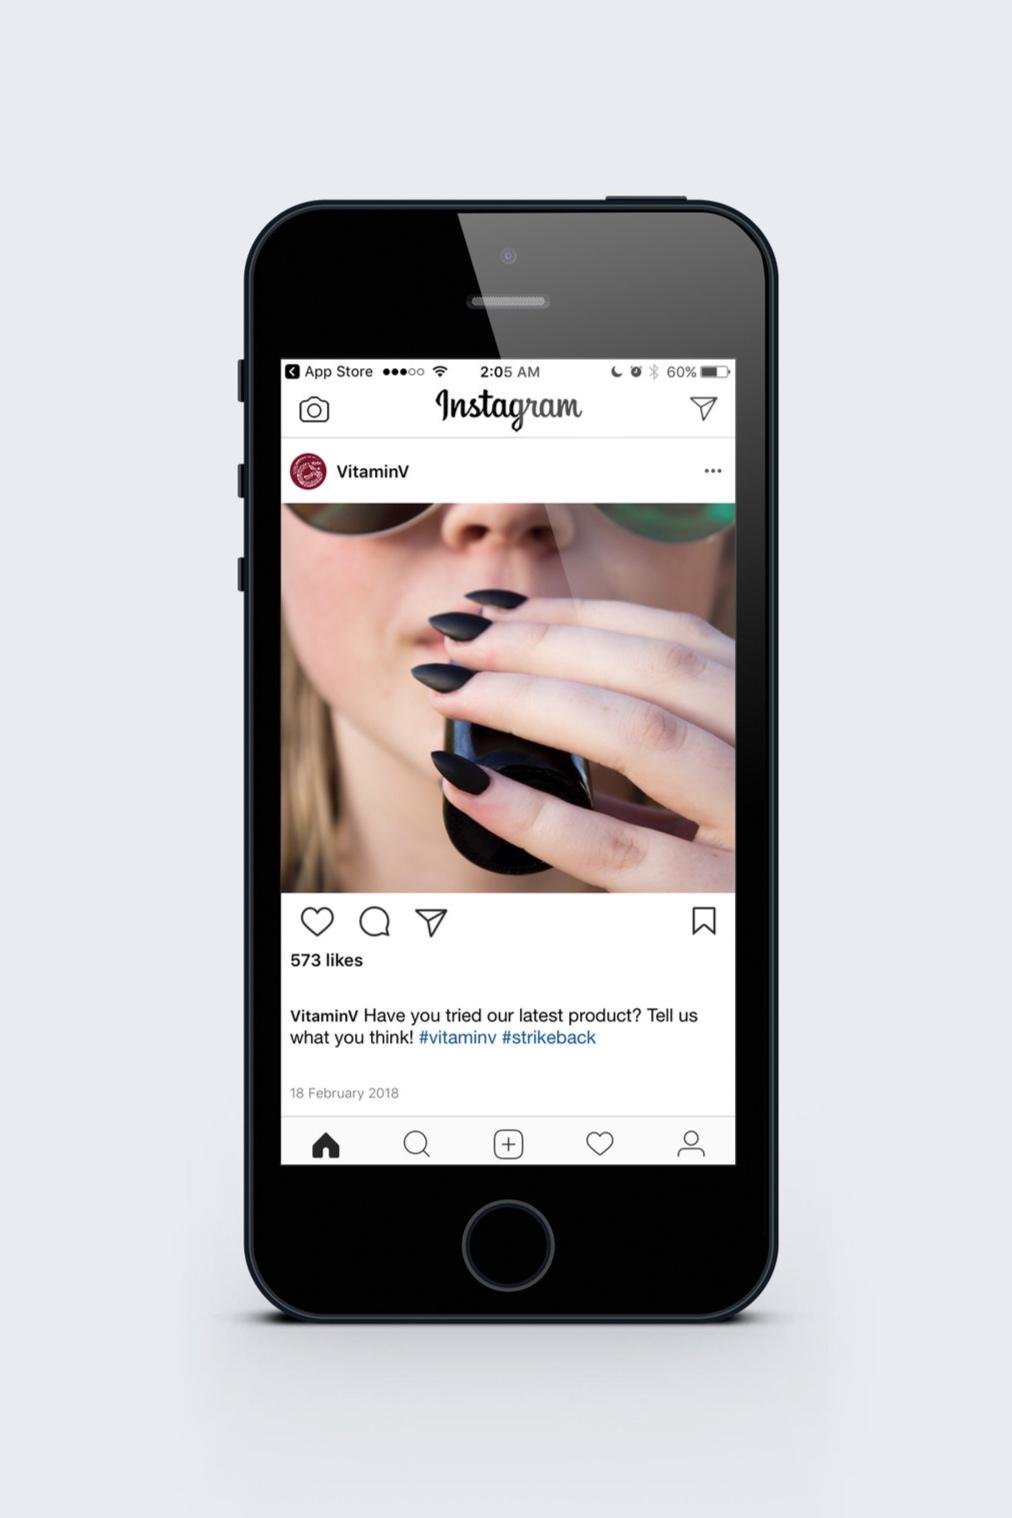 Digital advertising example via Instagram